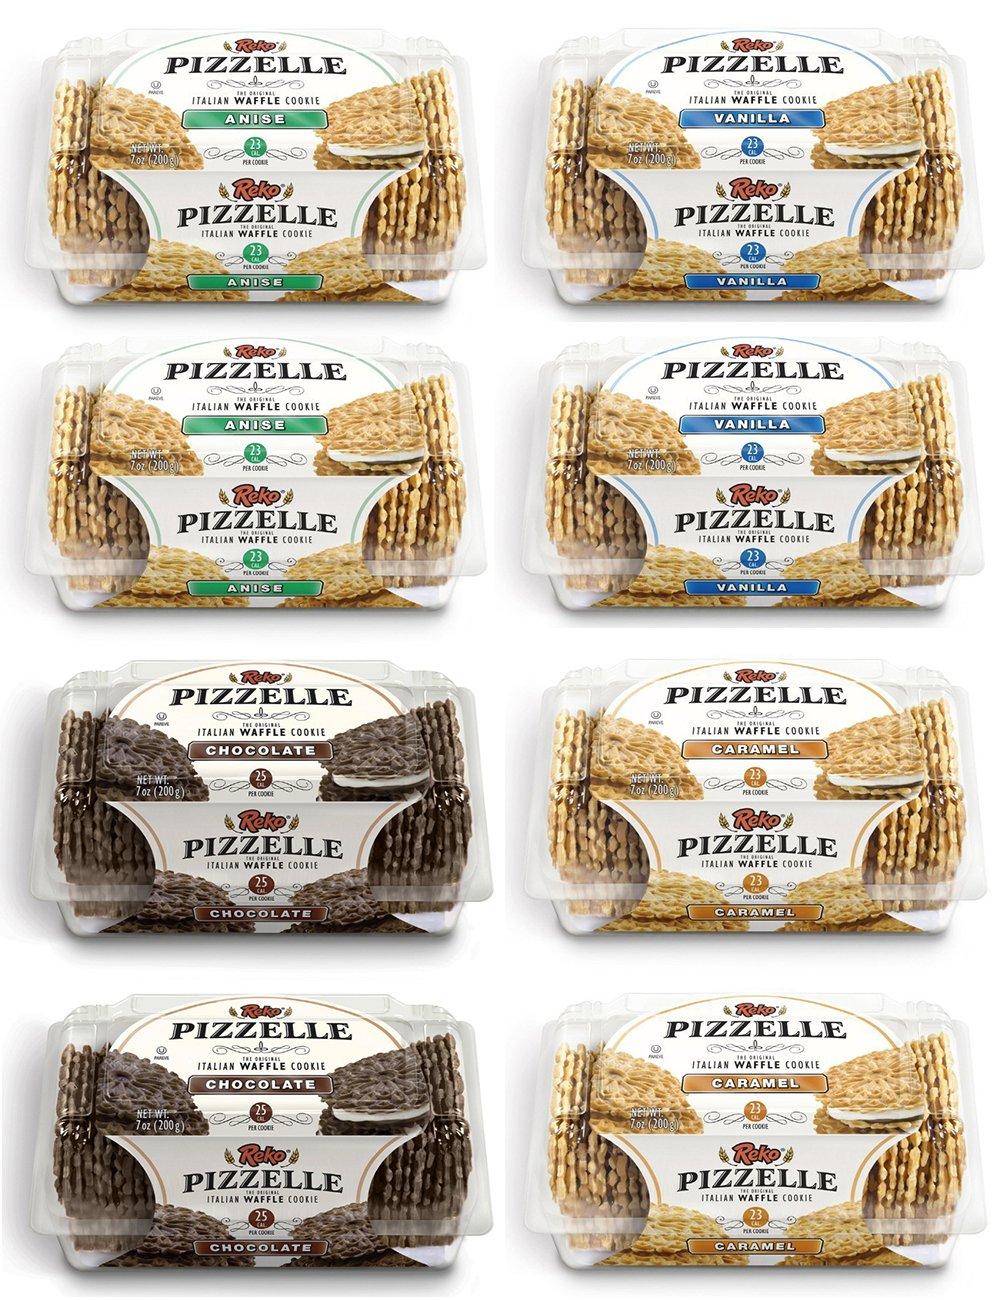 Amazon.com: Reko Pizzelle Cookies 4 Flavor Samplers - Anise ...